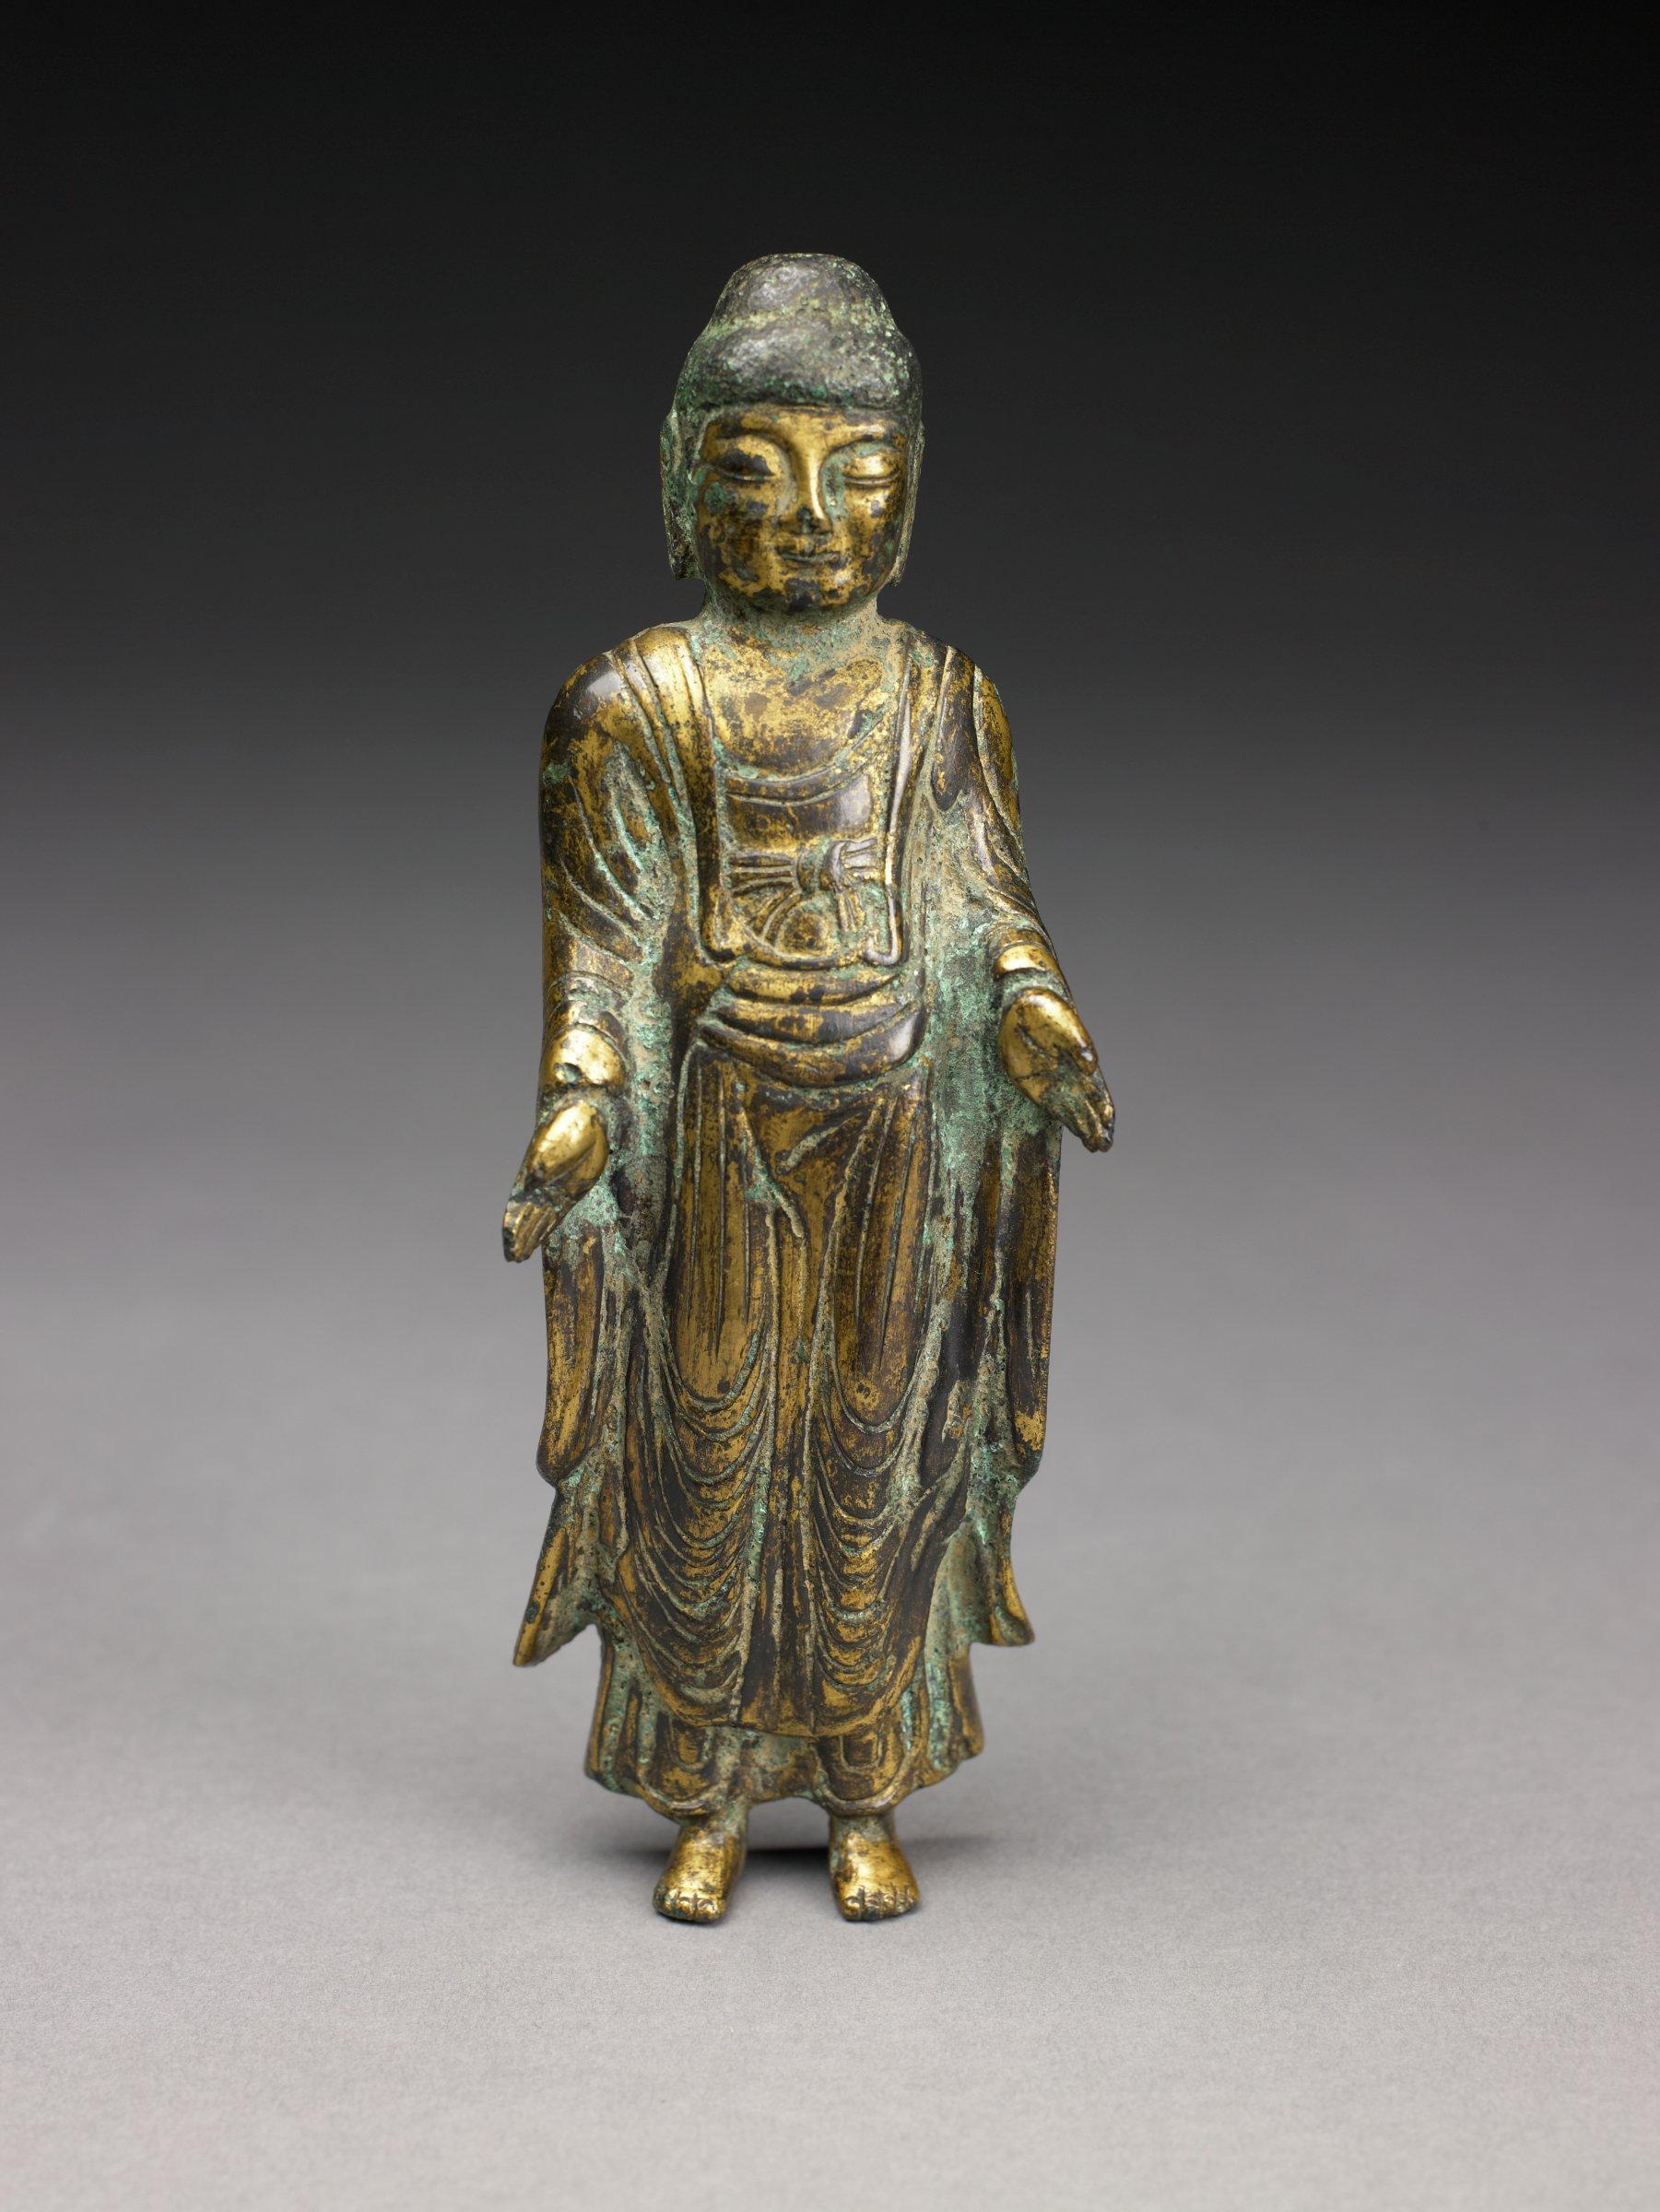 Standing image of Buddha, base missing